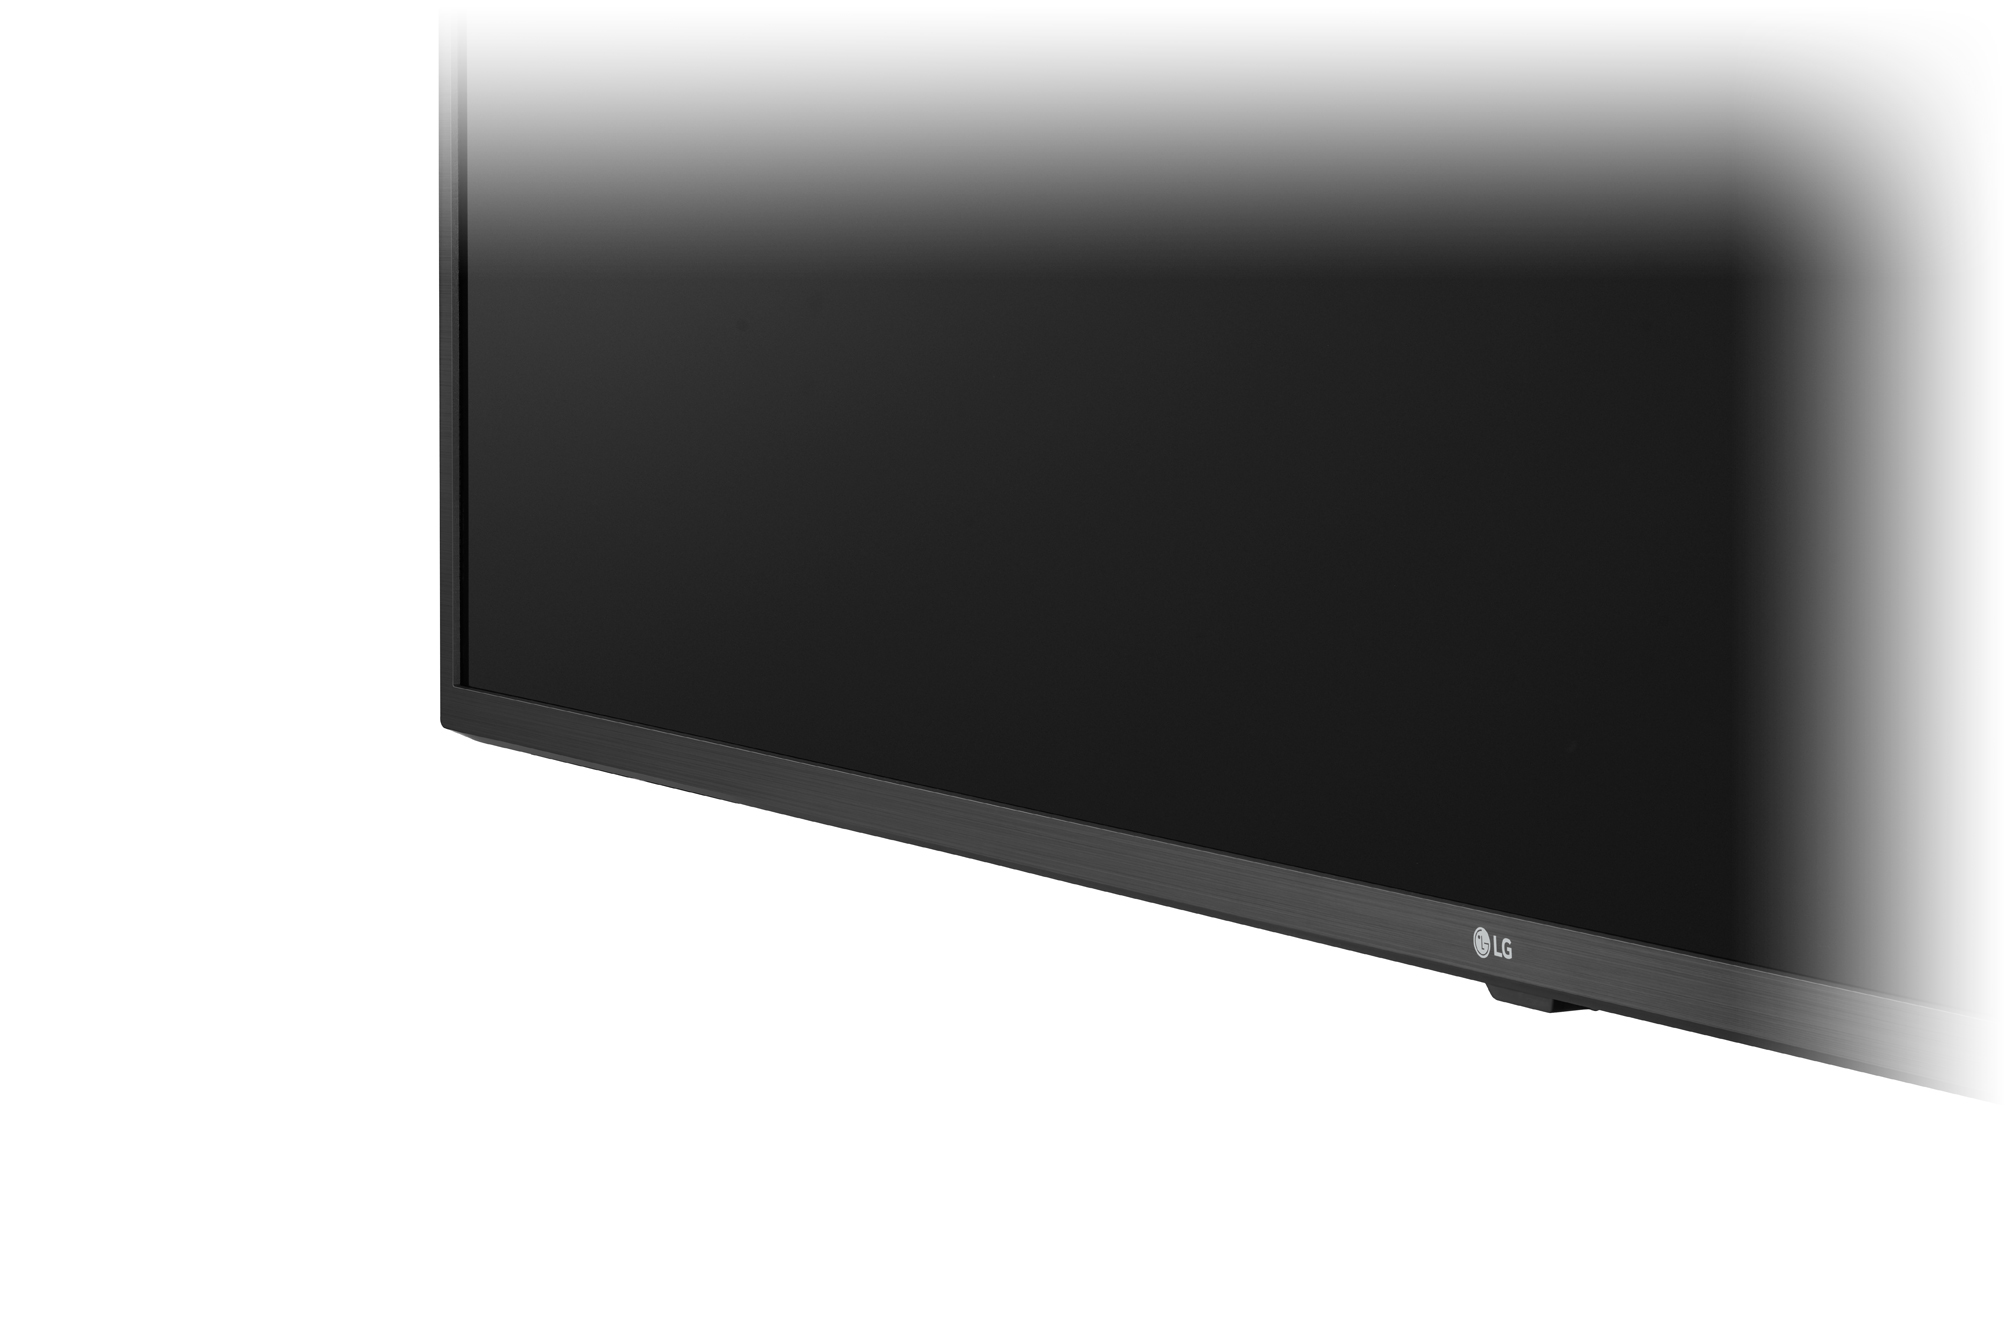 LG Smart TV Signage 70UT640S (CIS) 10